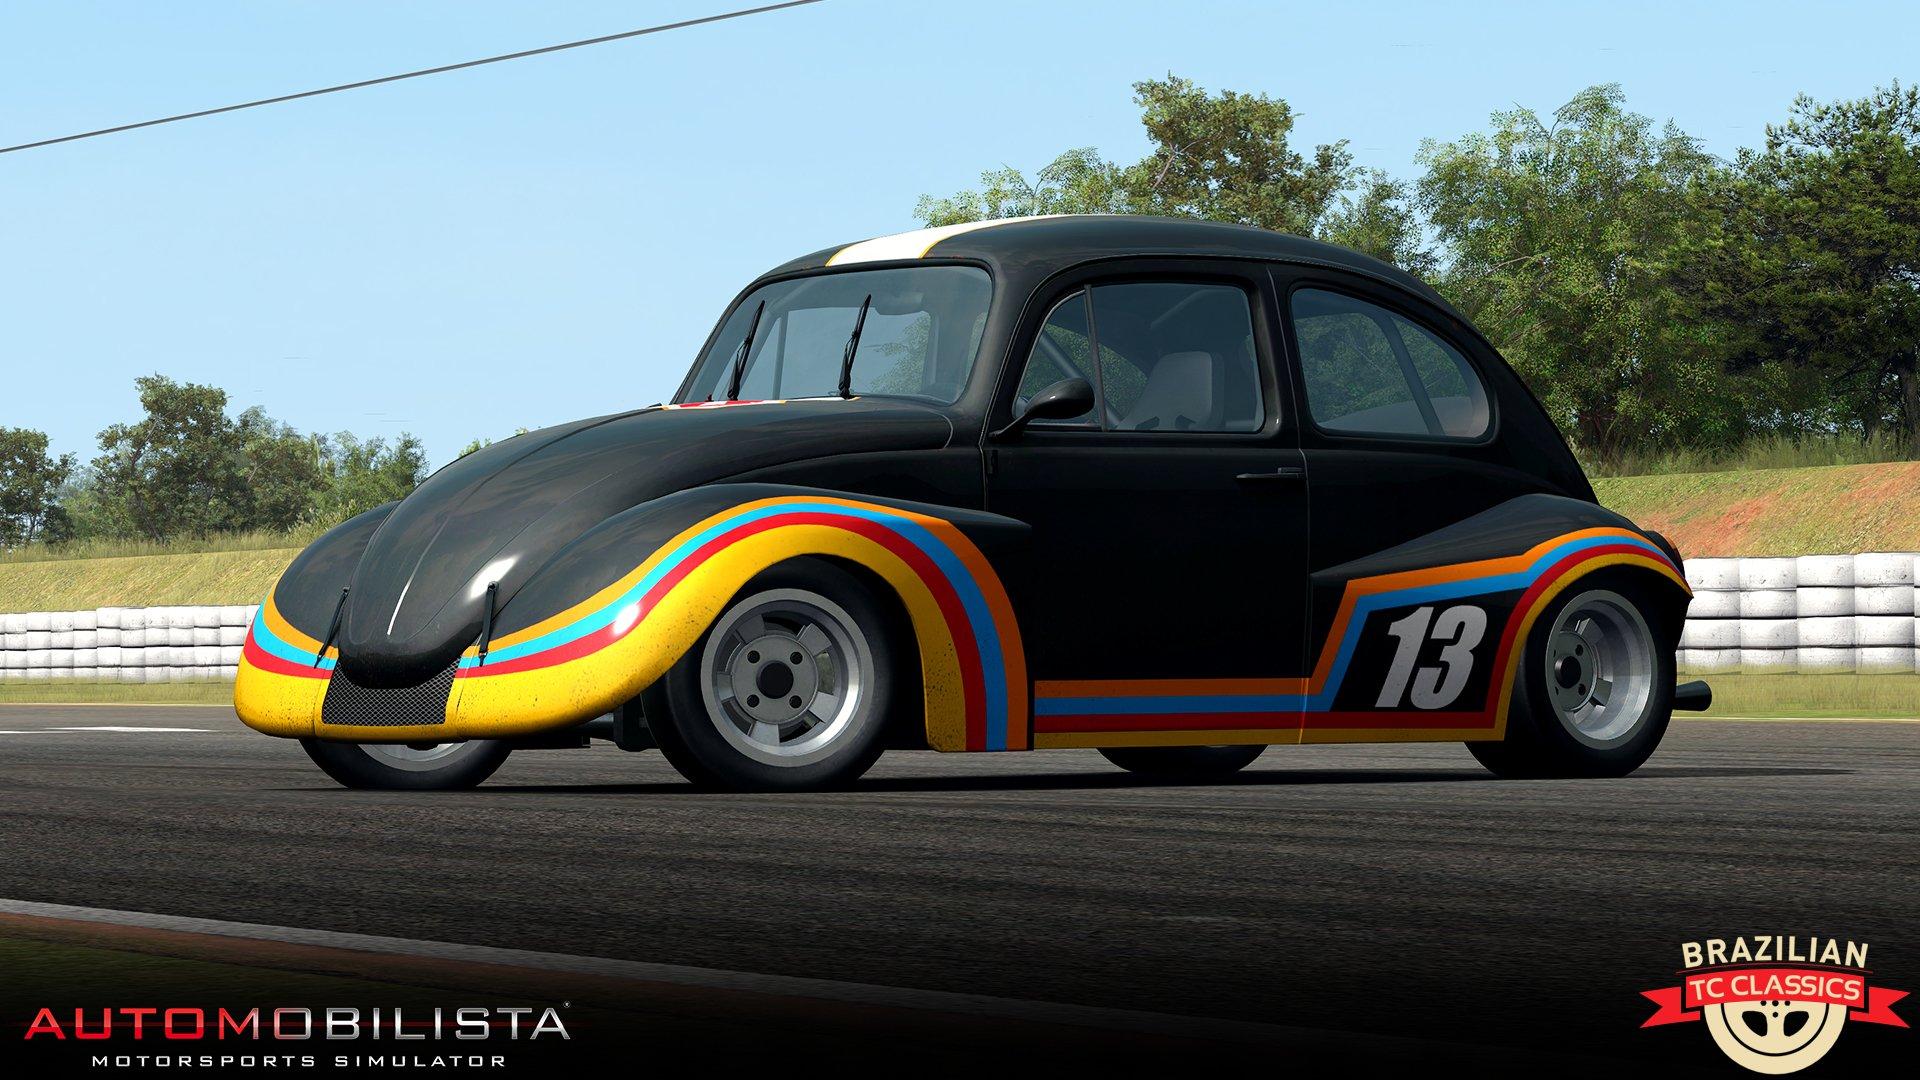 Automobilista Brazilian Touring Car Classics Steam Screenshot 4